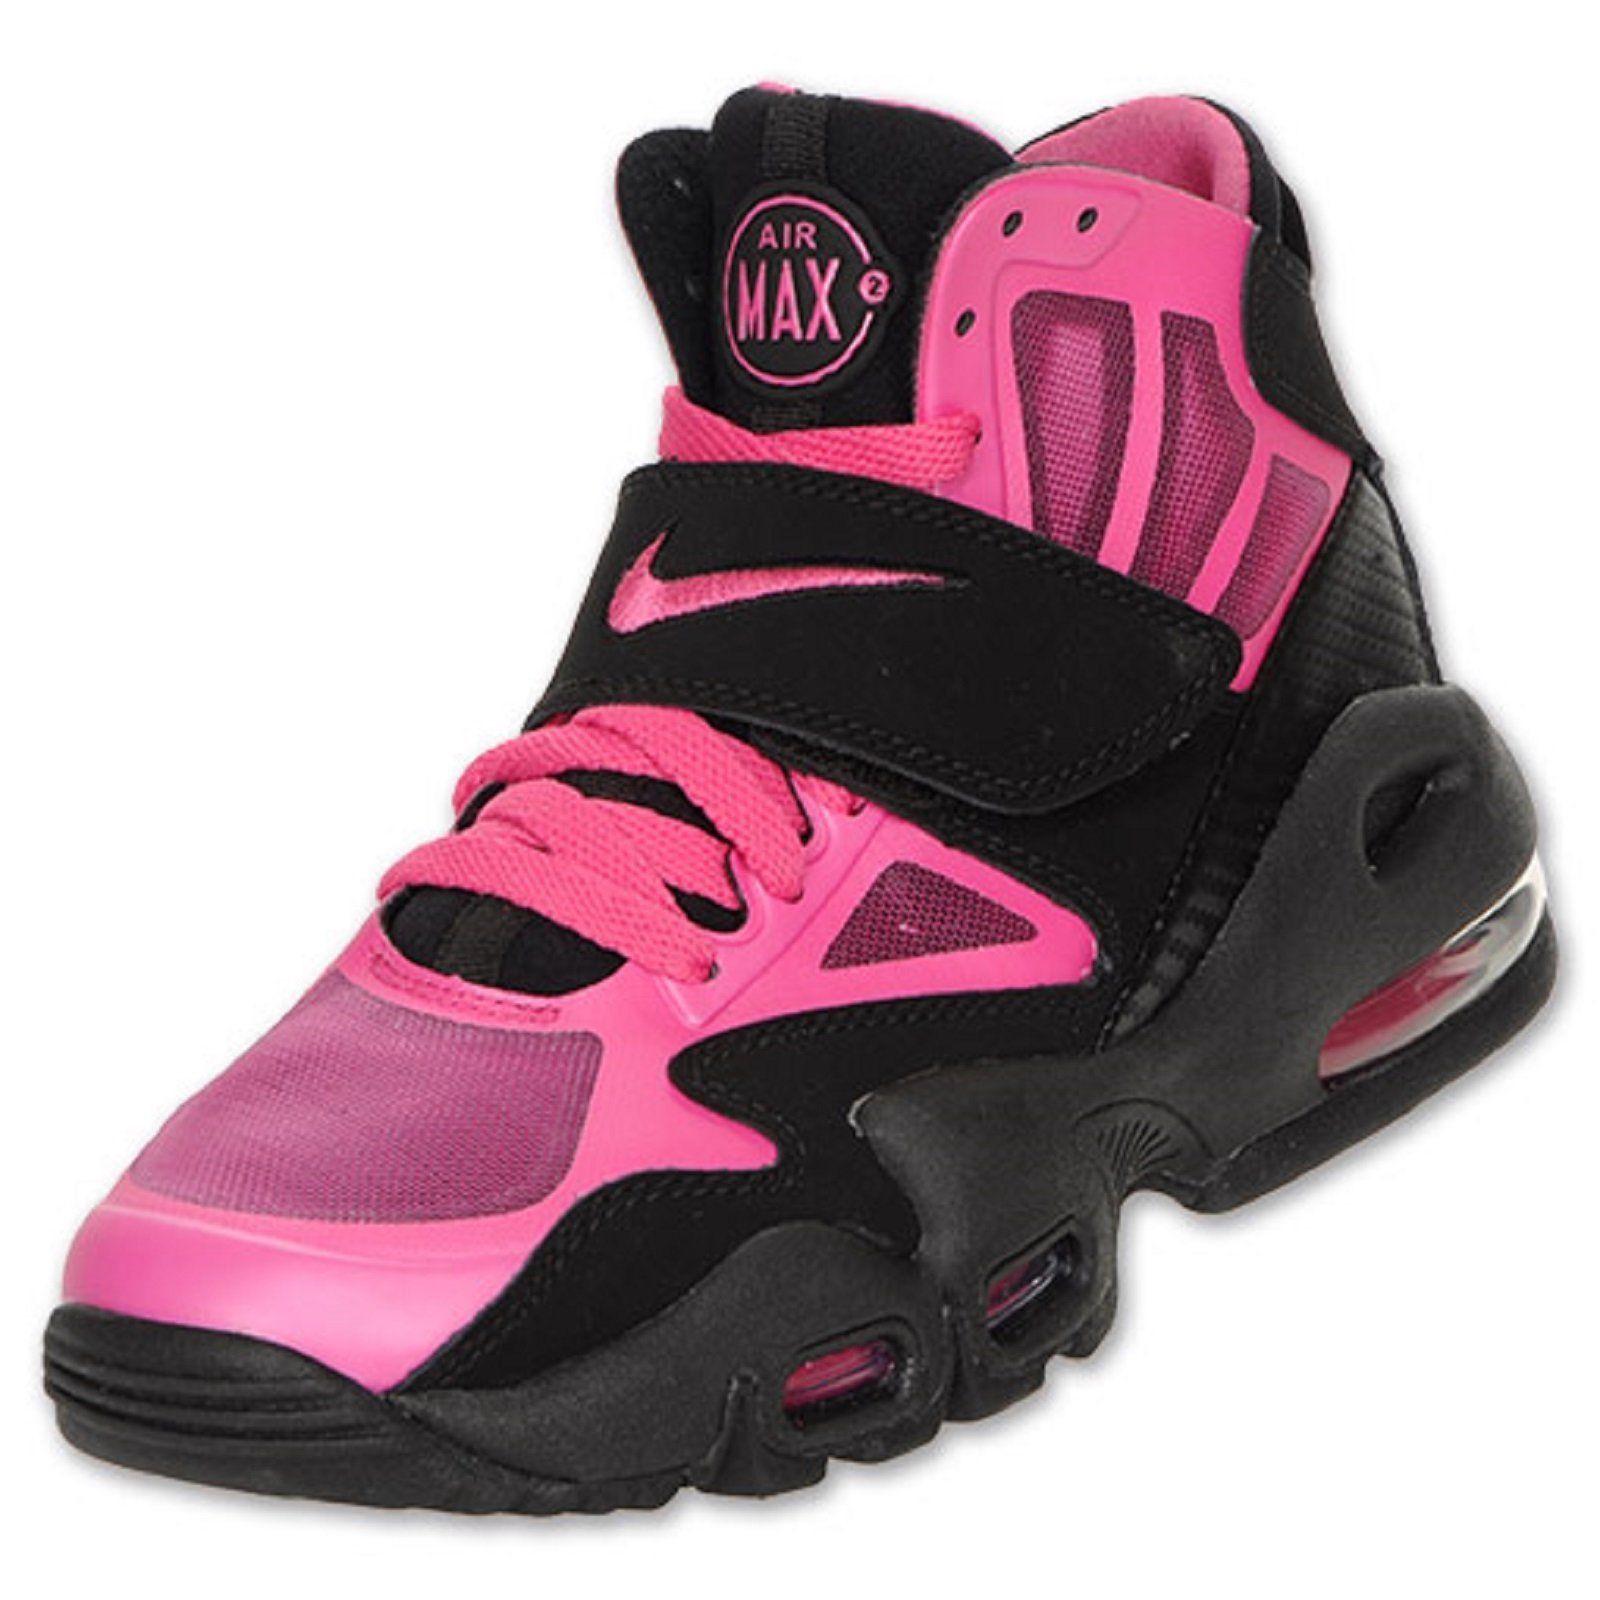 best website 84bdc efc7b Girls Shoes Nike AIR MAX EXPRESS Youth Size 4 (Womens Sz 5.5) Black Desert  Pink